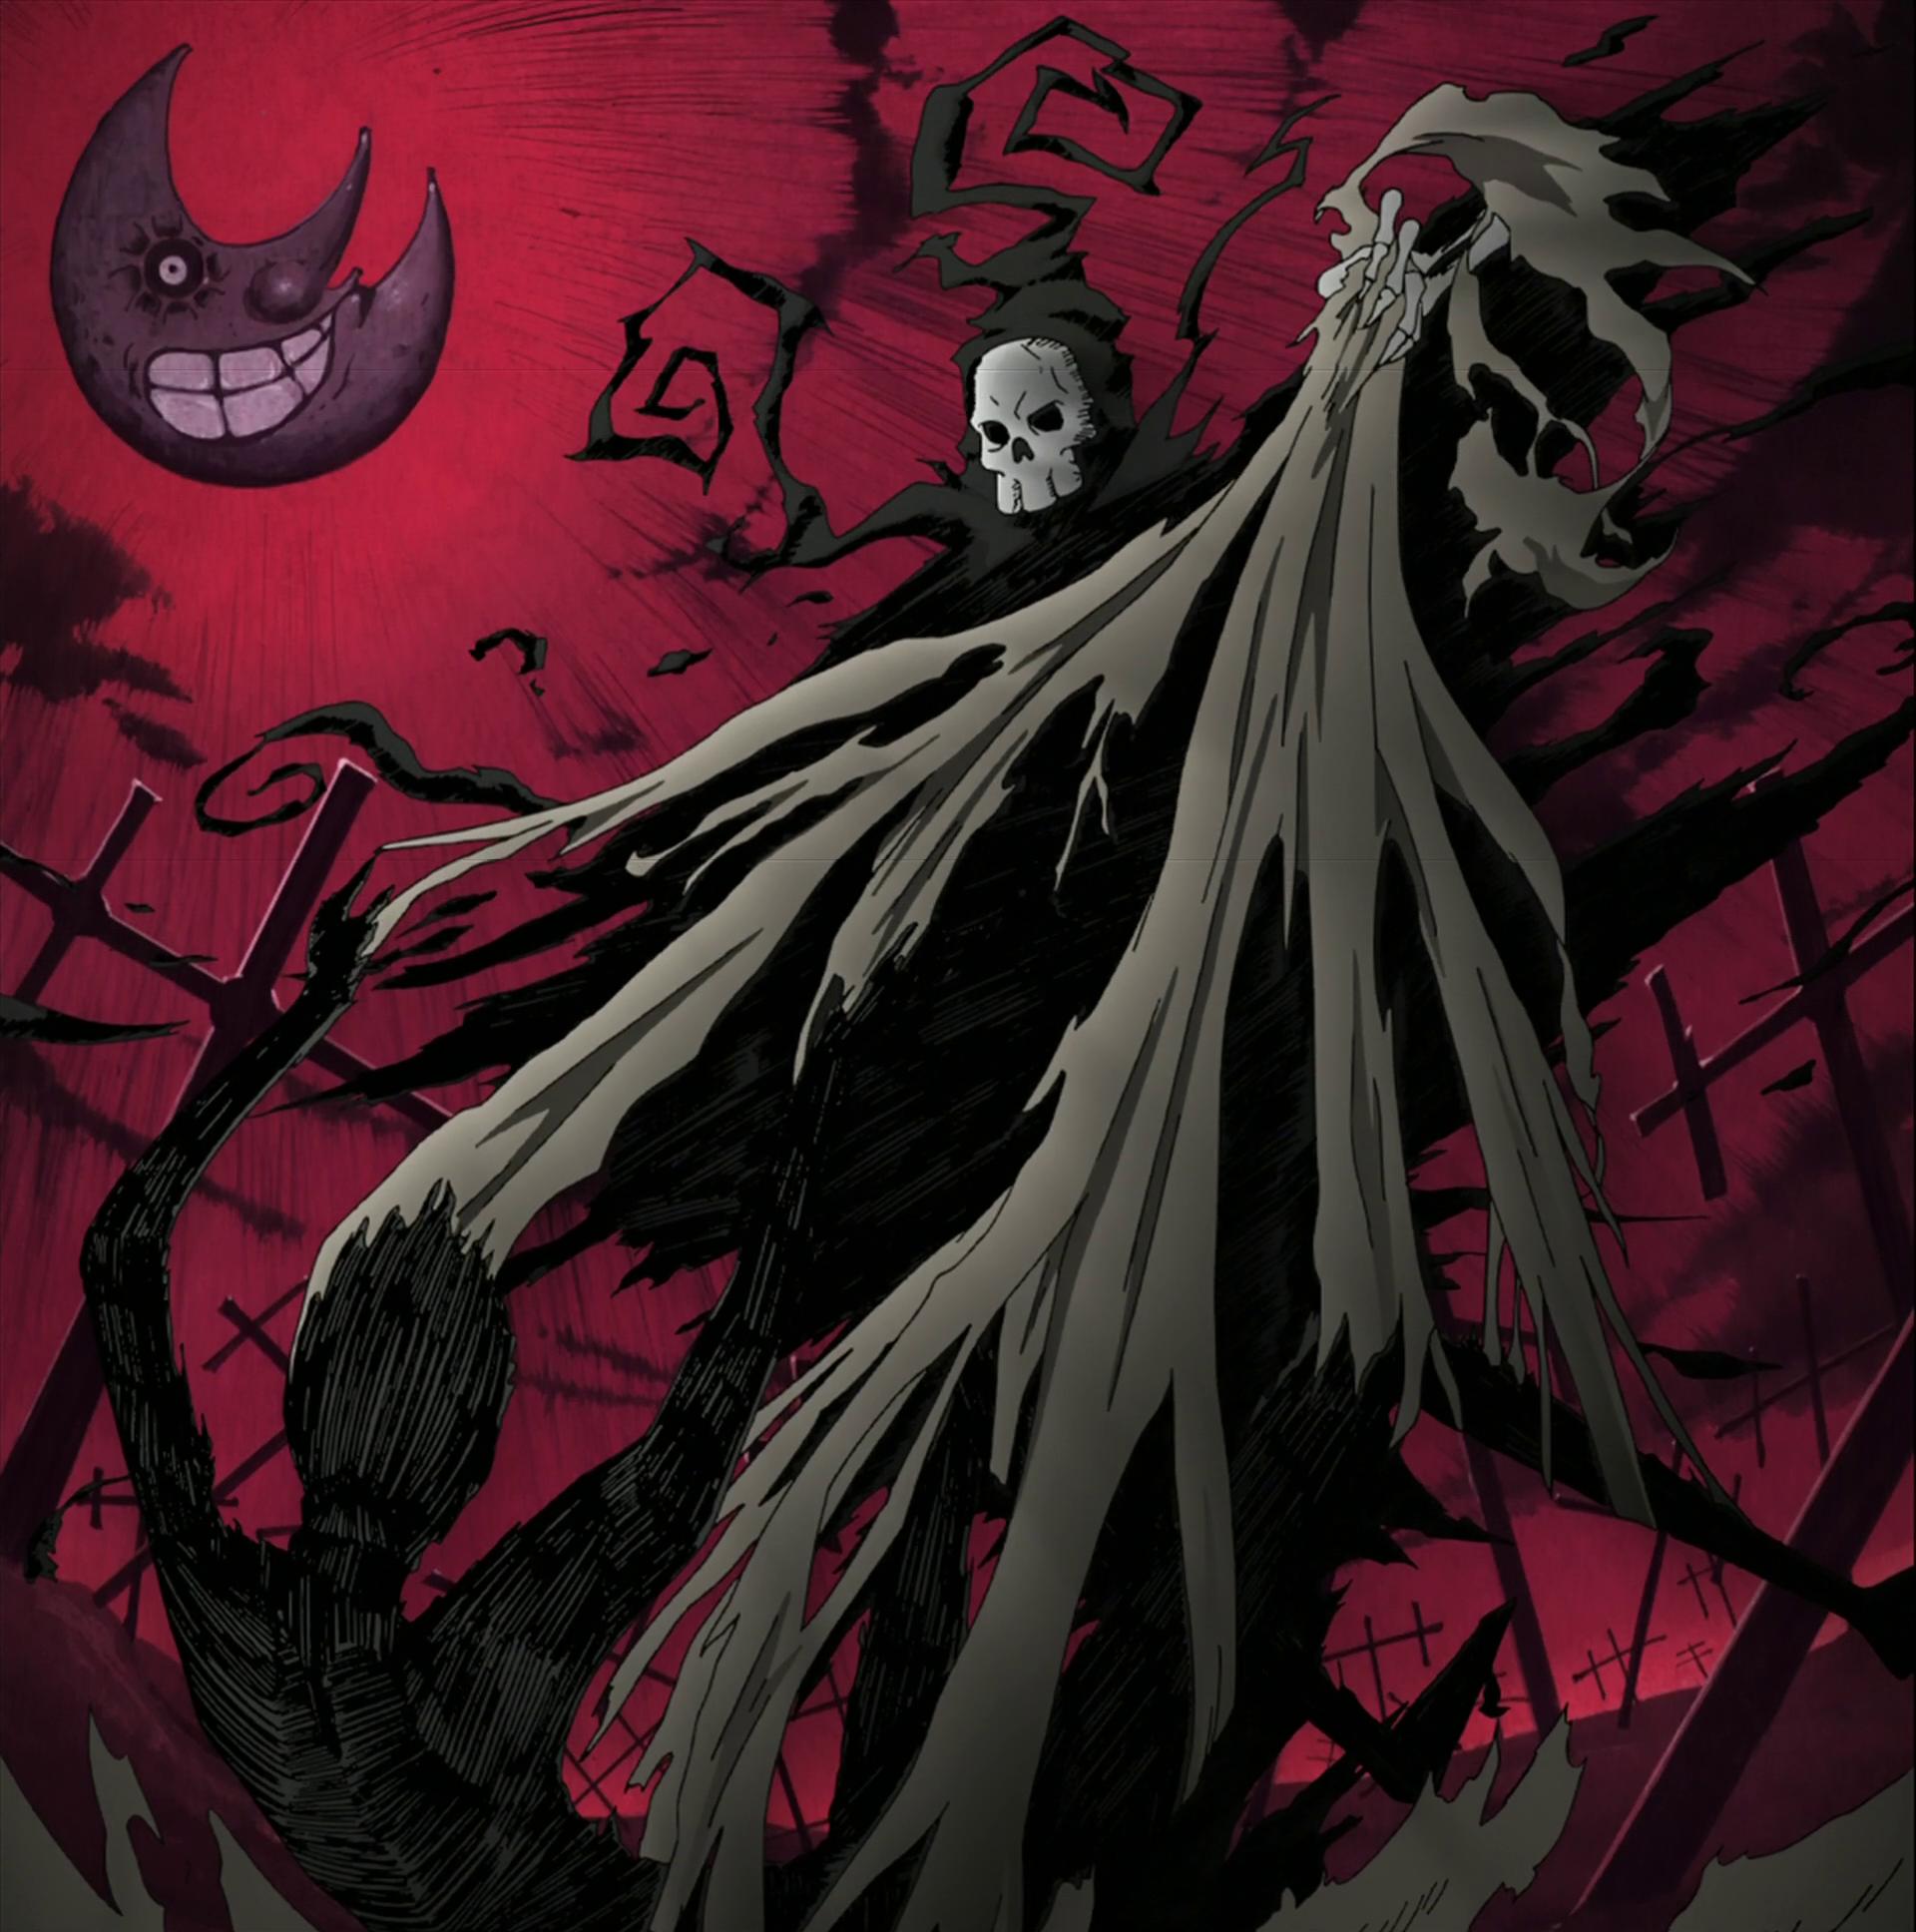 Asura | Soul eater, Fandom and Anime